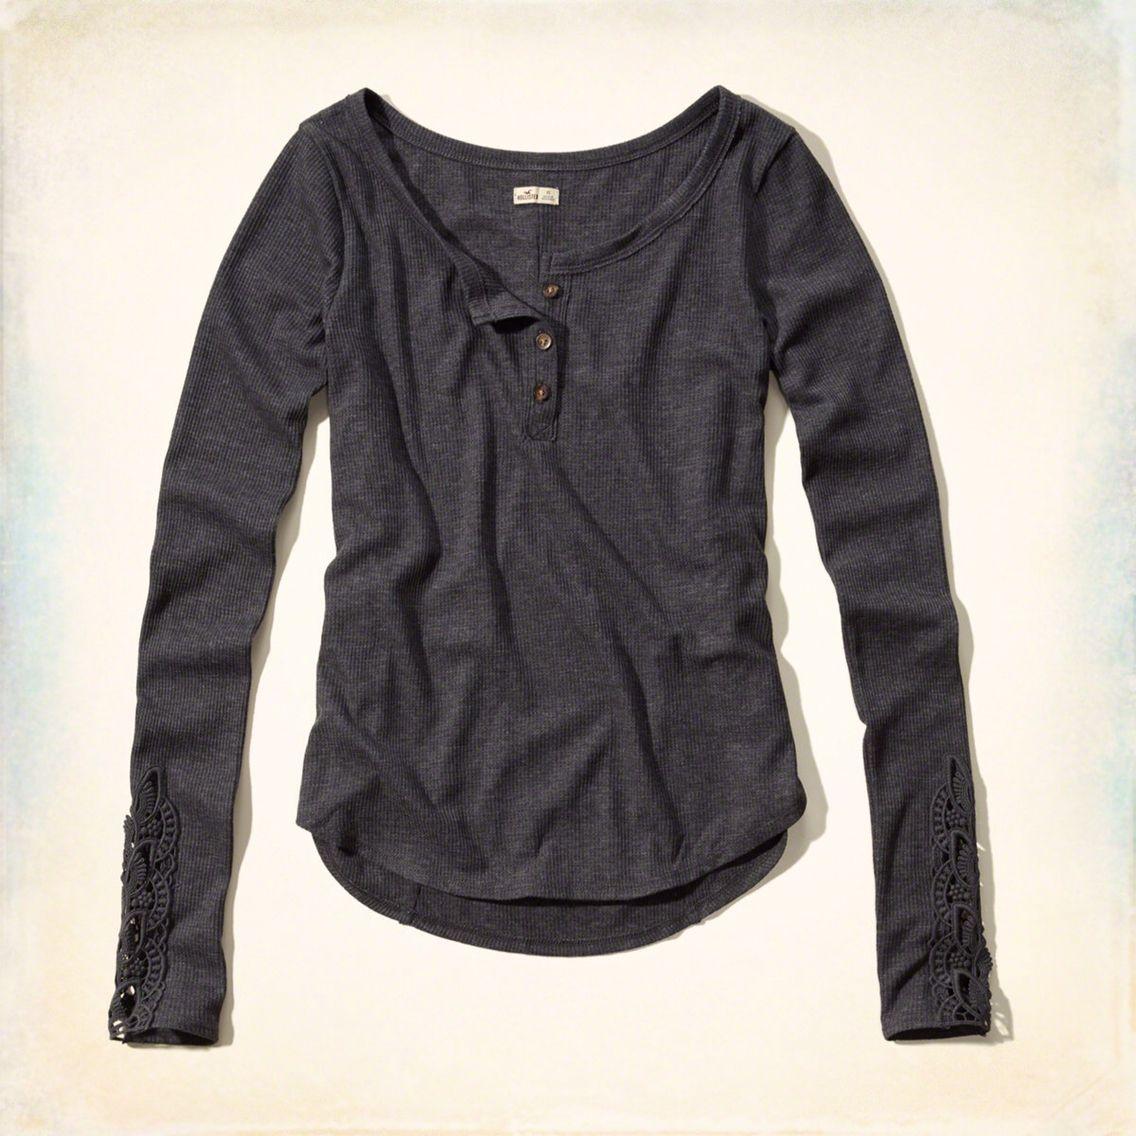 Uniqlo flannel jacket  Hollister TShirt  Clothing  Pinterest  Hollister